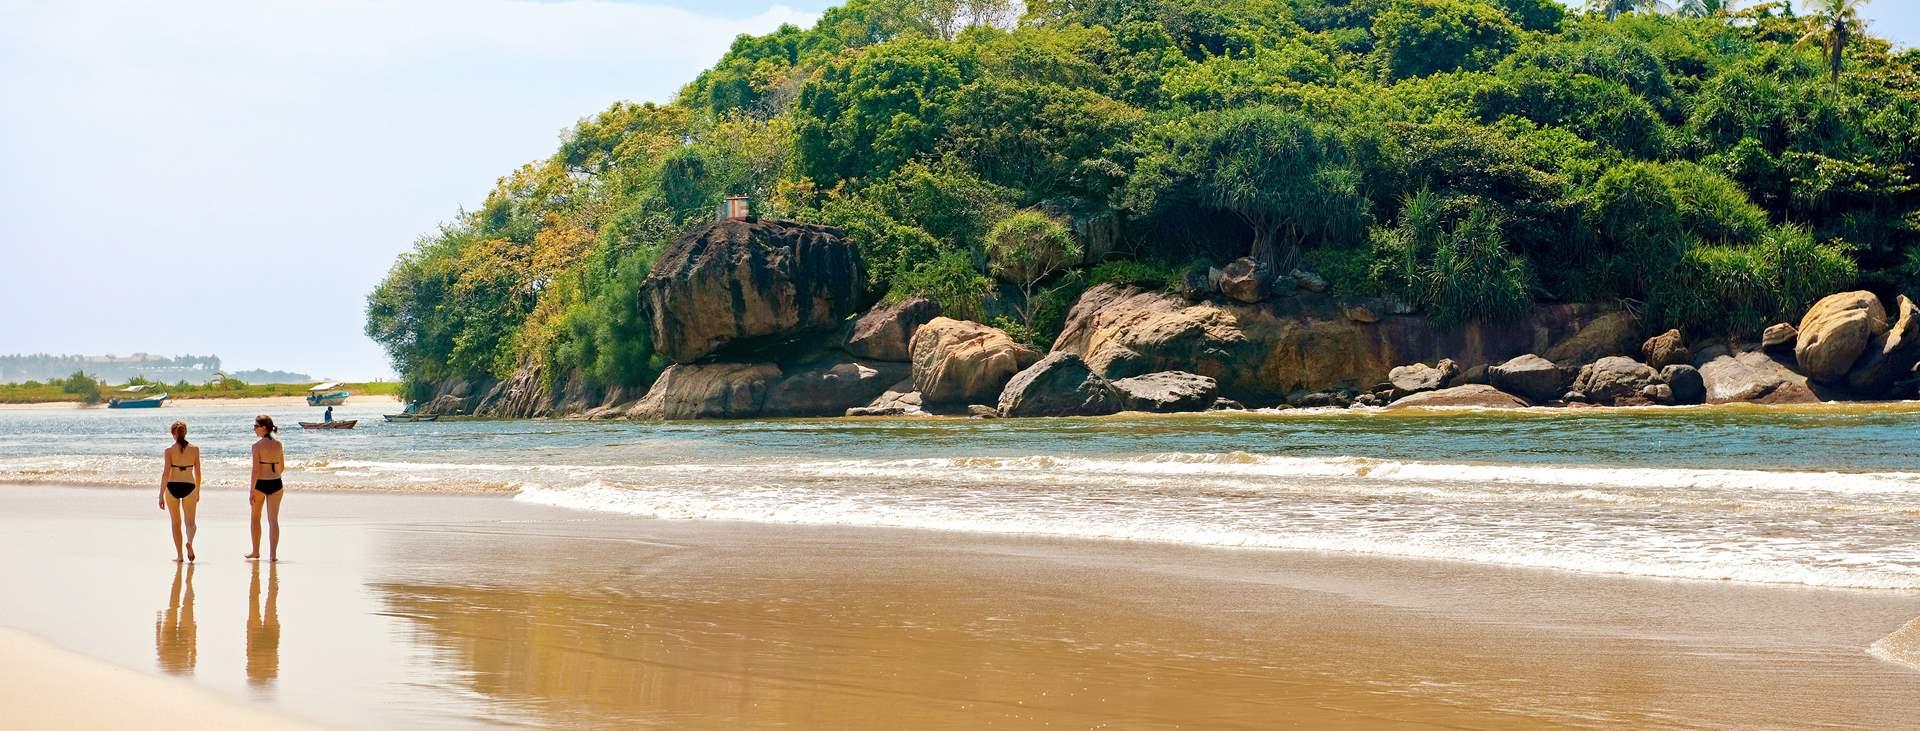 Boka din resa till Beruwela på Sri Lanka med Ving